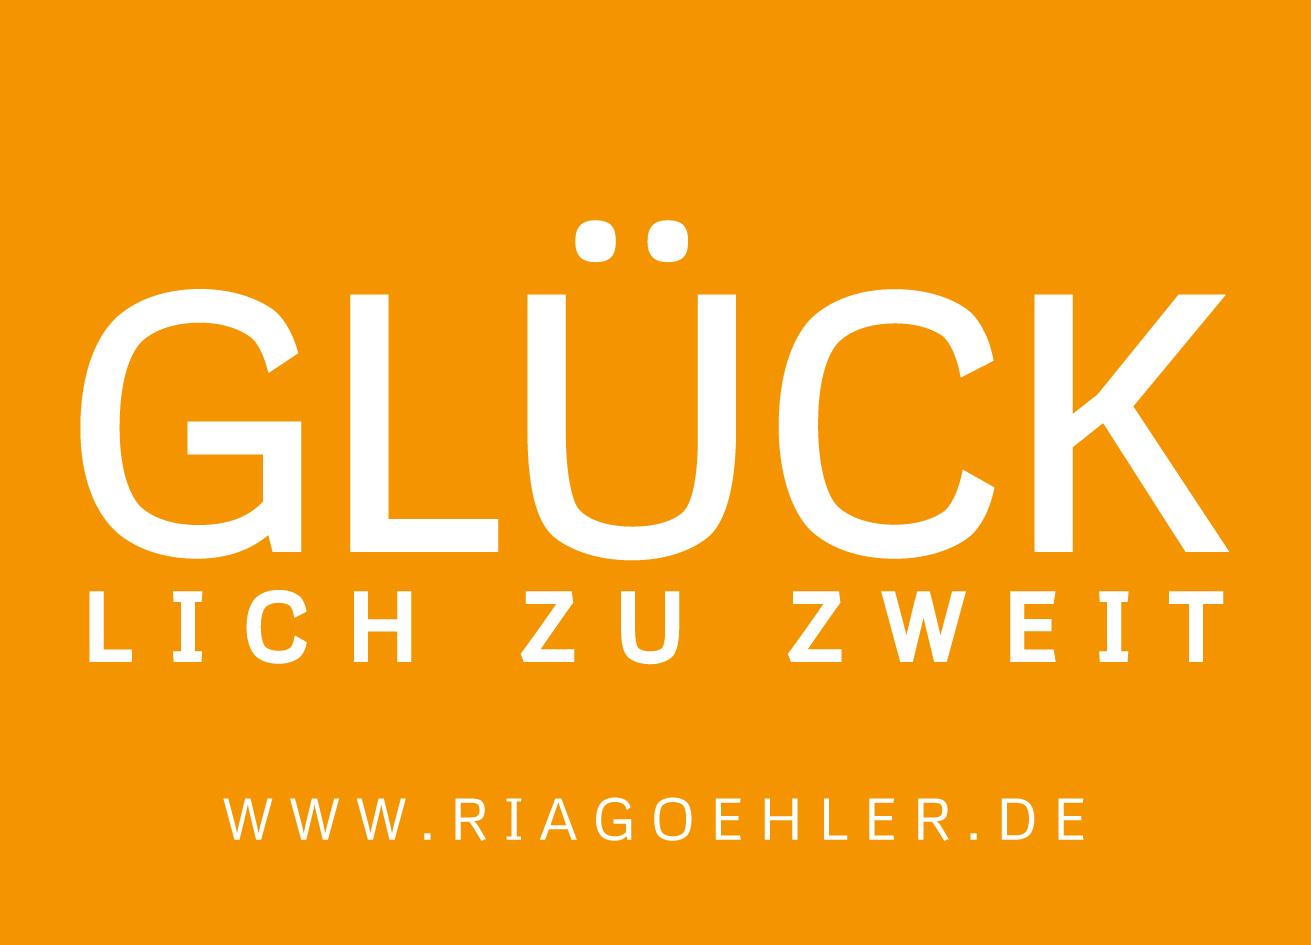 finya de wirklich kostenlos Würzburg